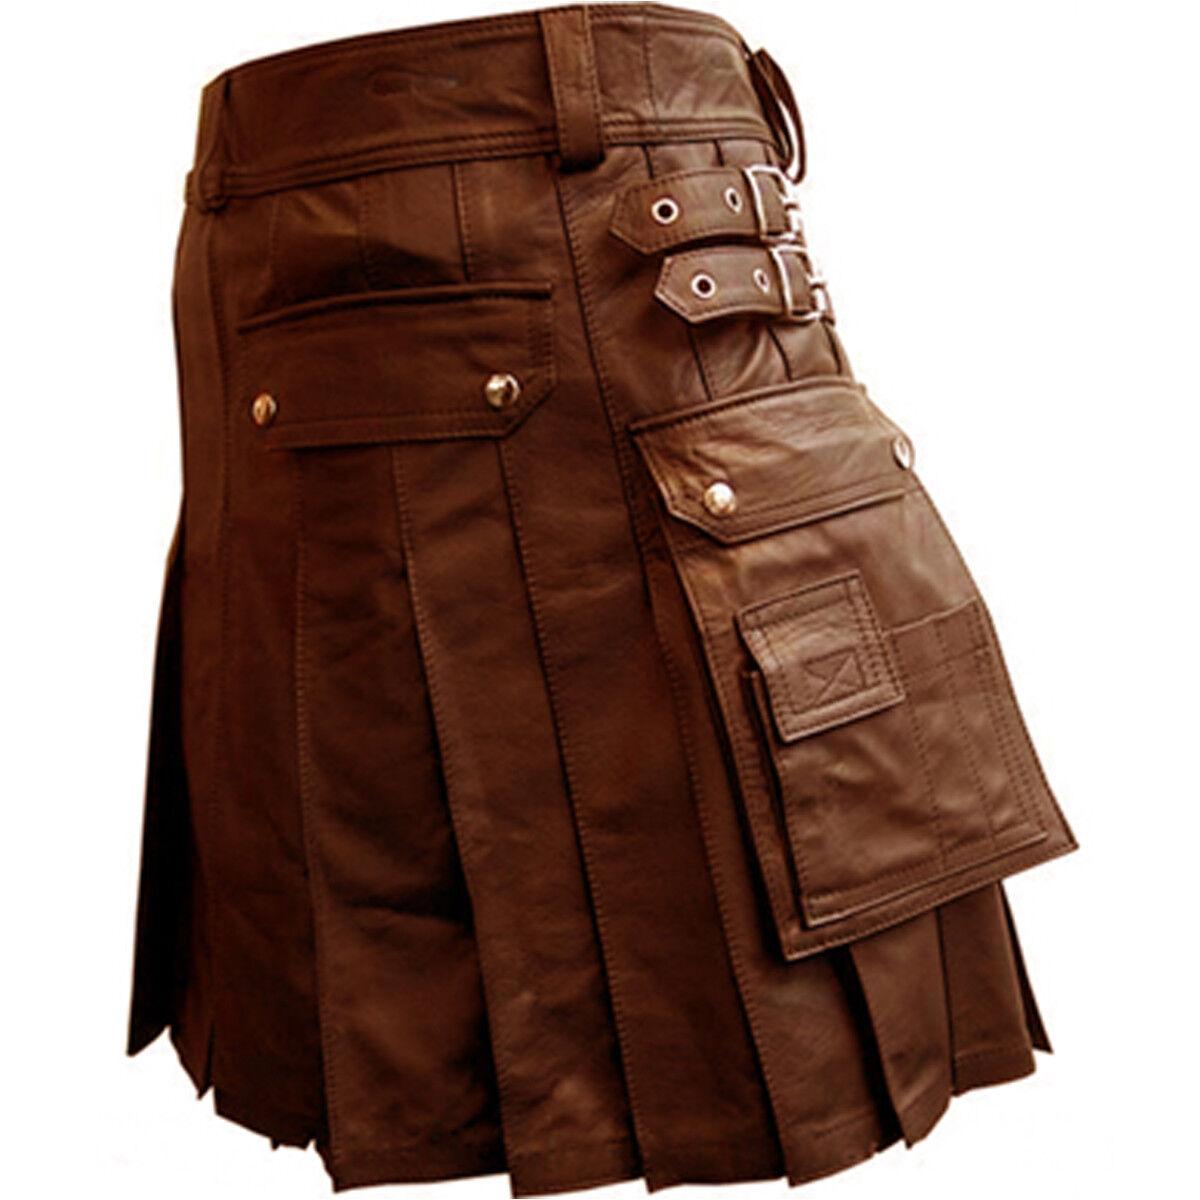 Men REAL Brown Leather Gladiator Pleated Utility LARP Kilt